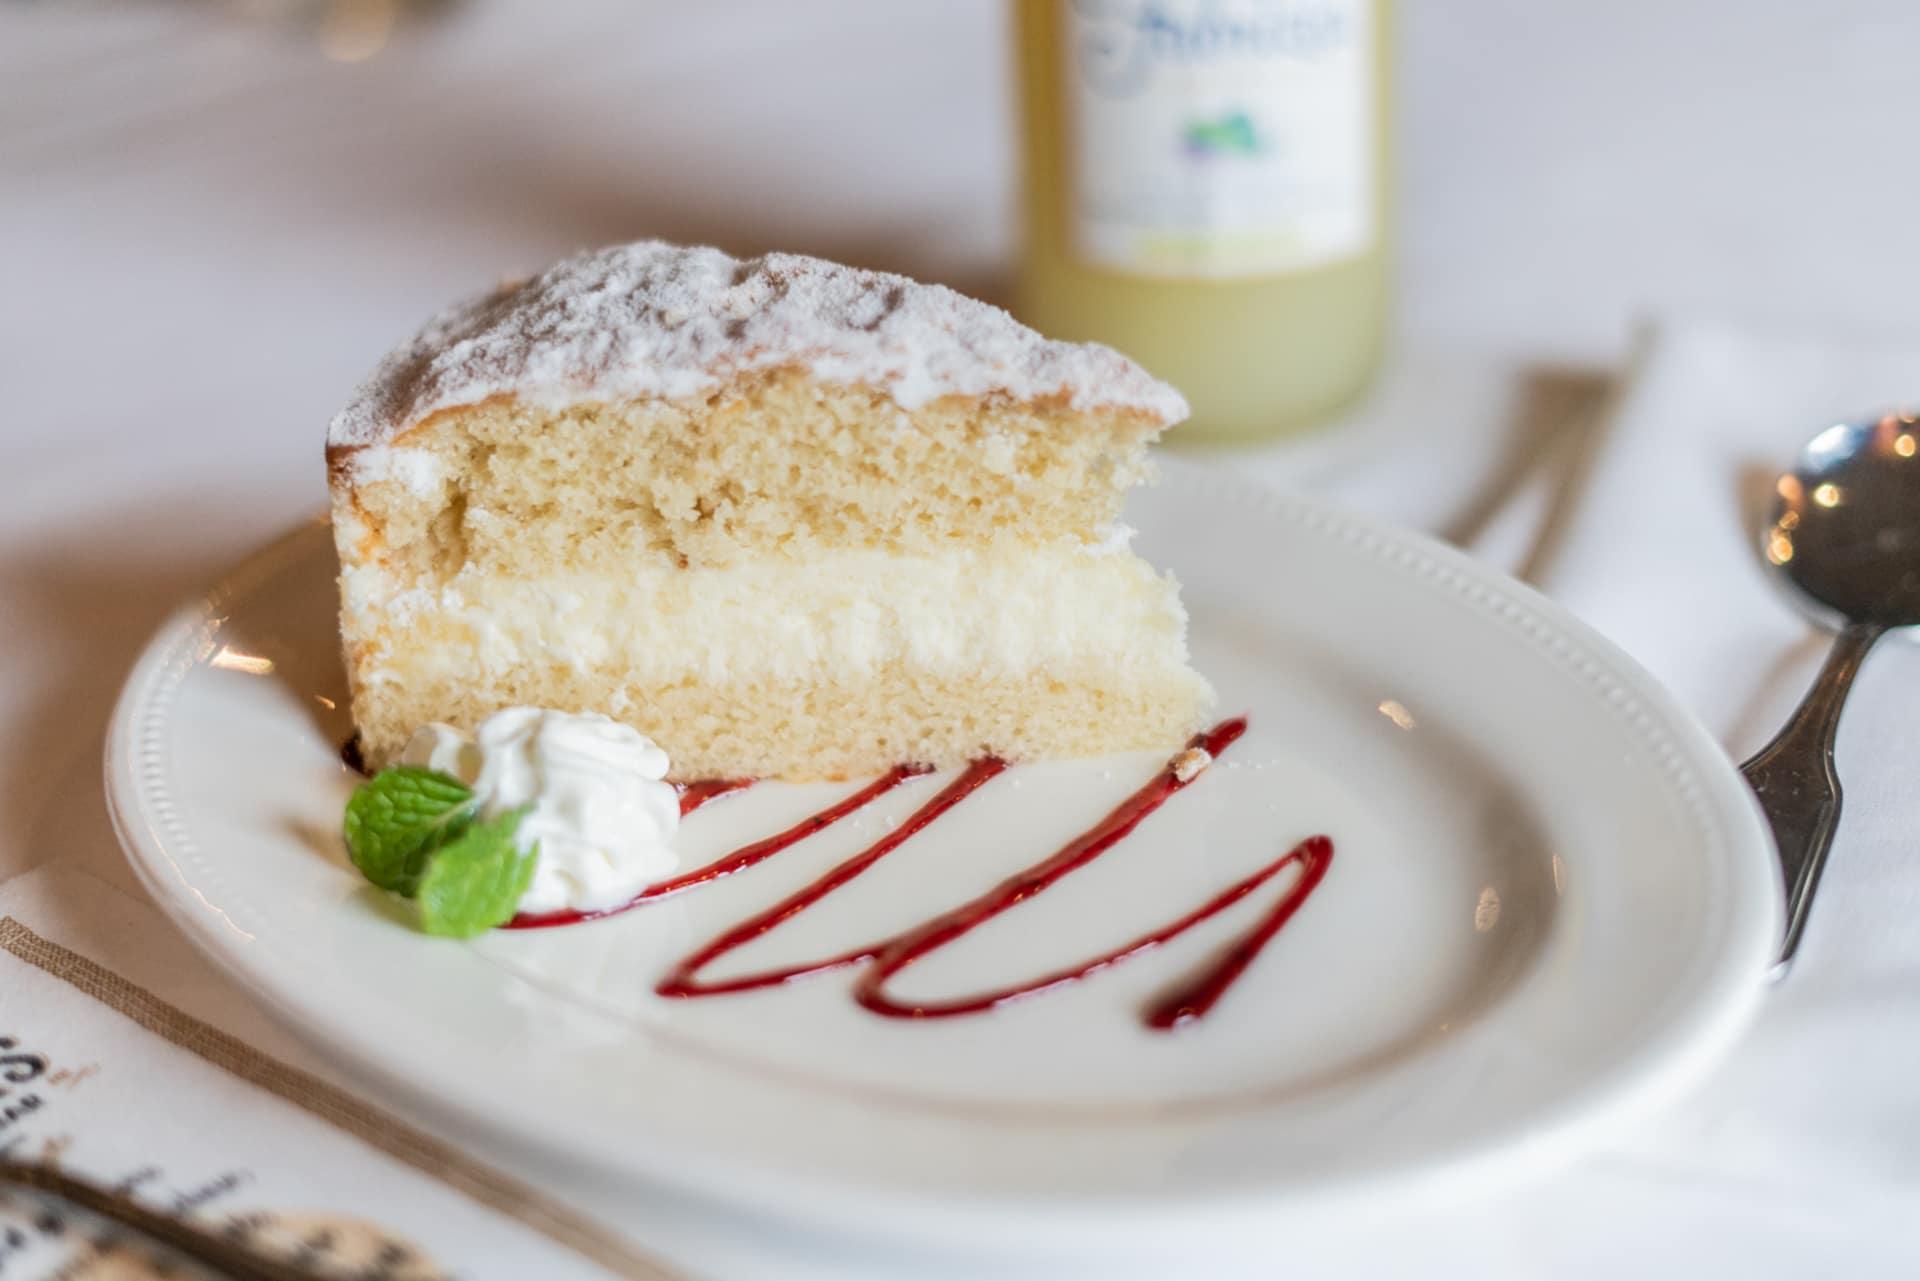 Italian Lemon Cream Layer Cake